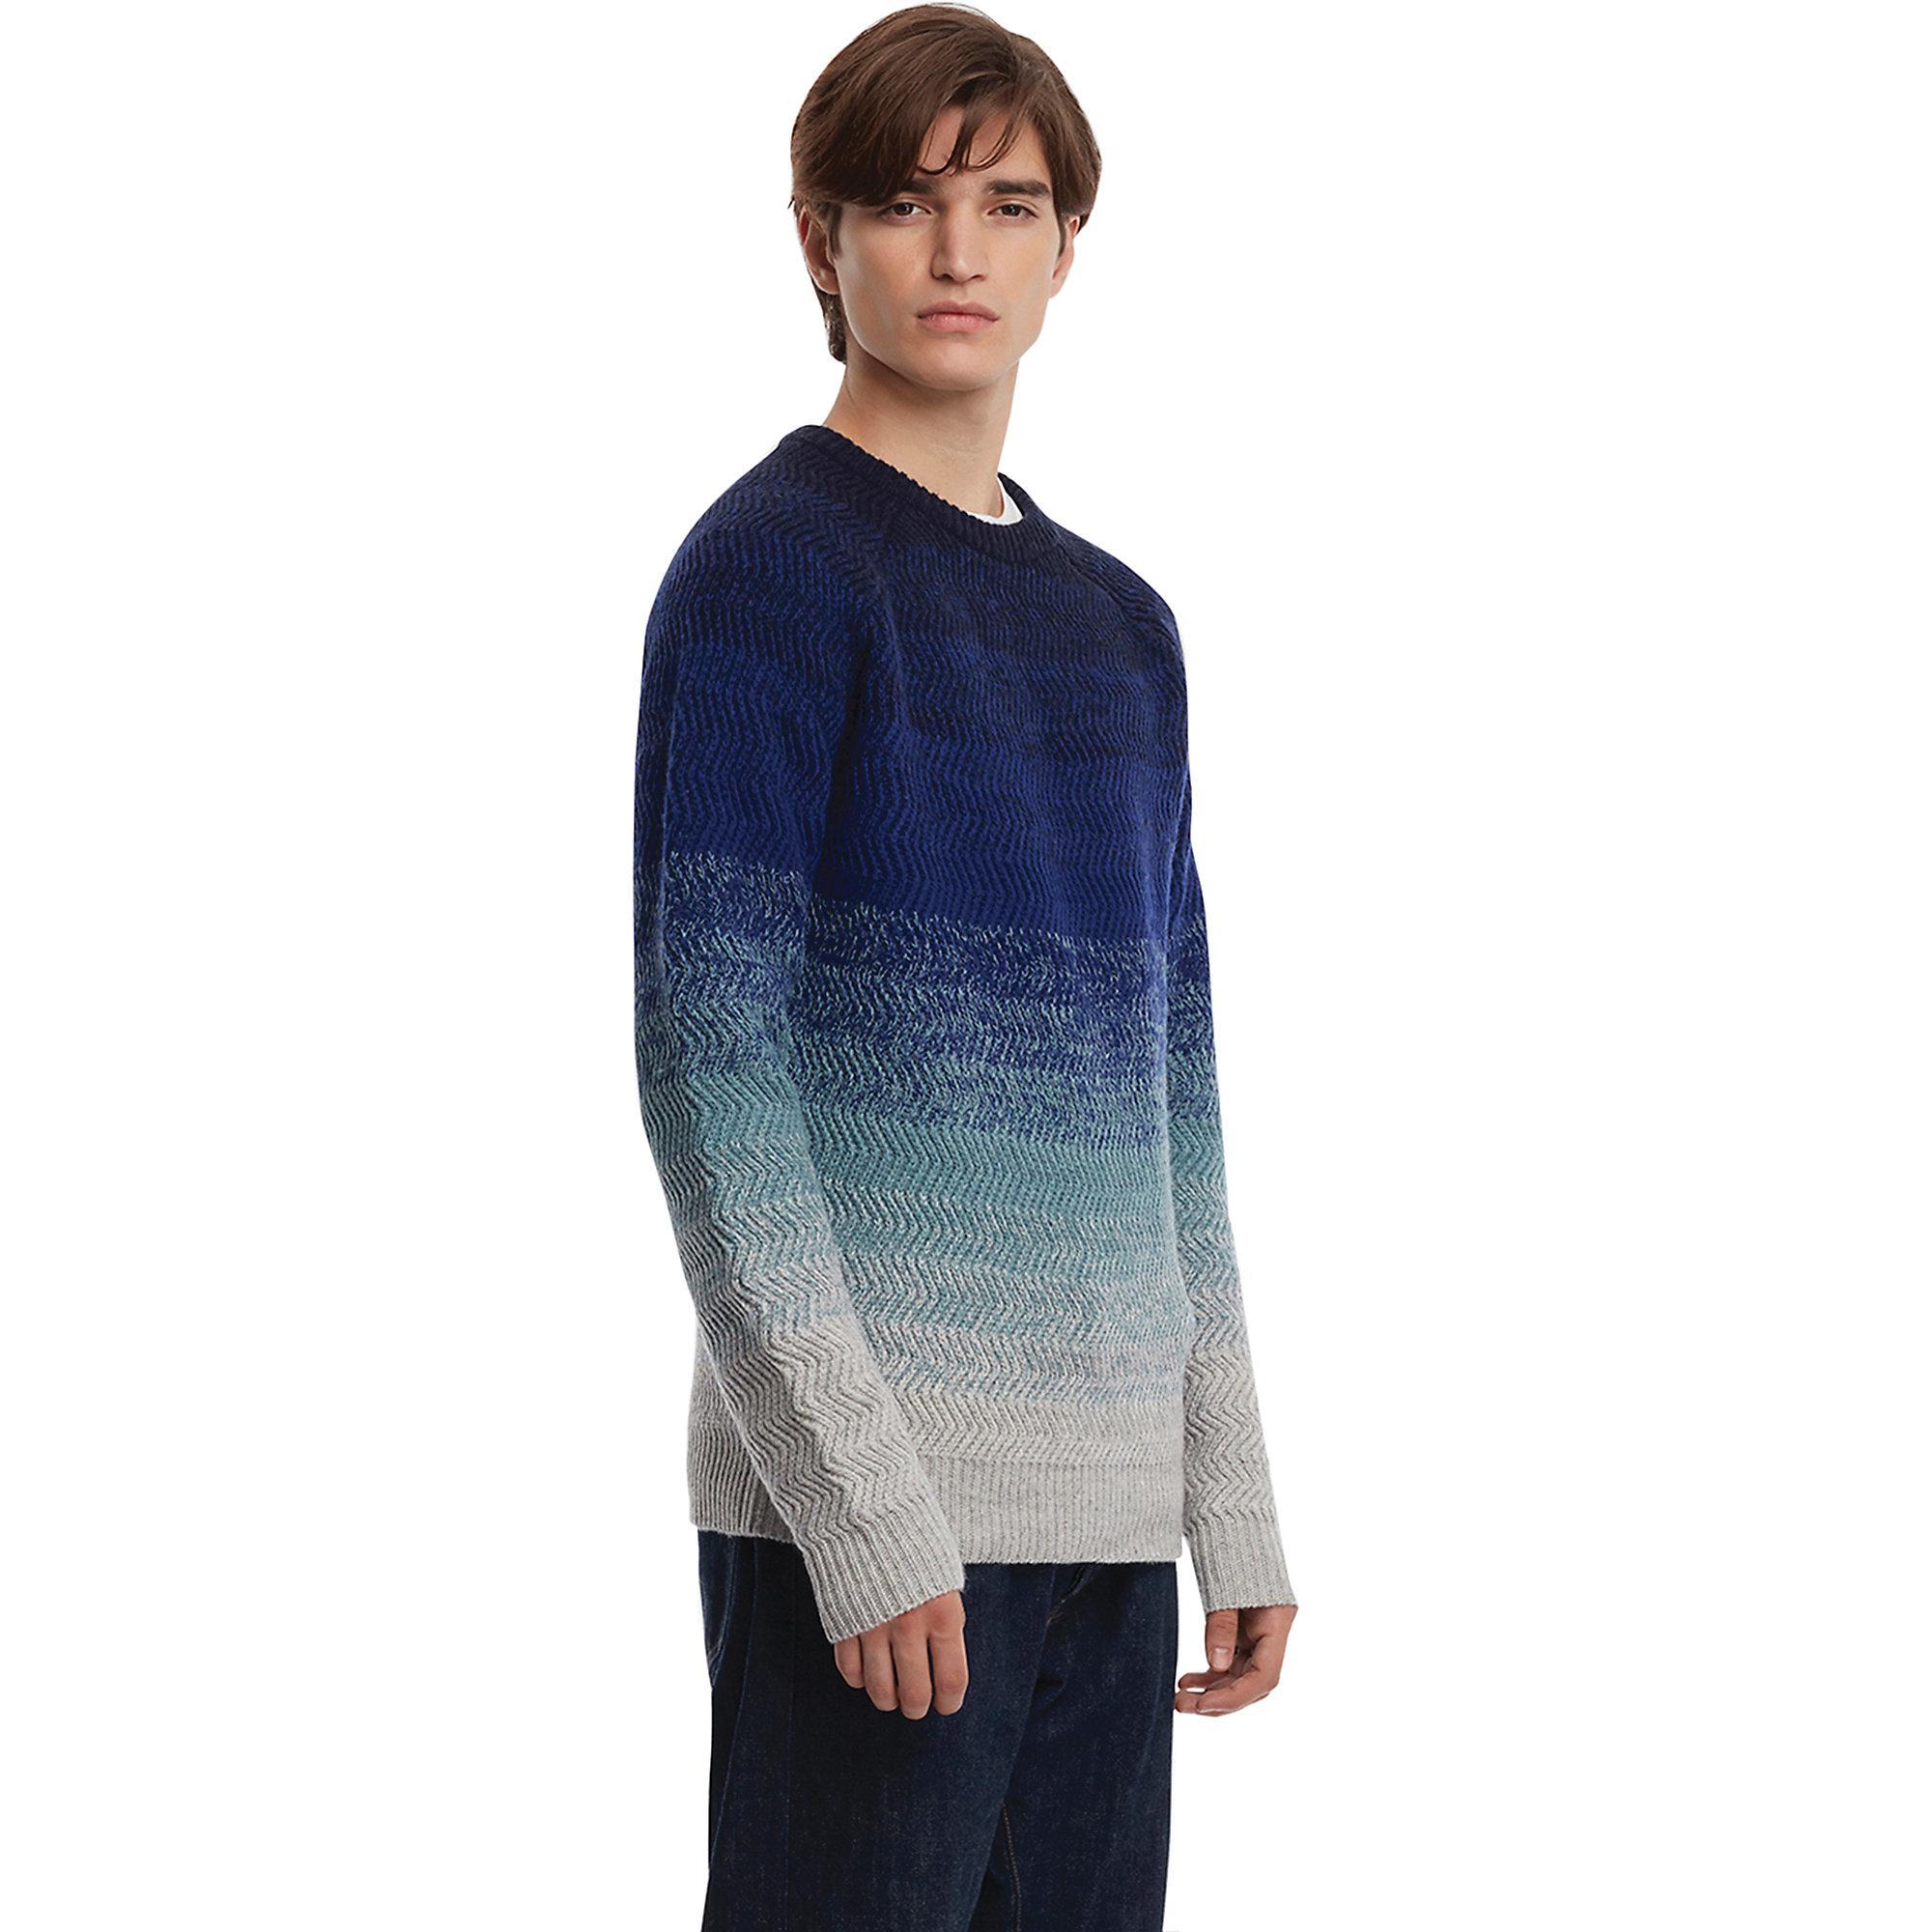 2c80750c3bd1c5 Penfield Bartlett Knit Sweater in Blue for Men - Lyst